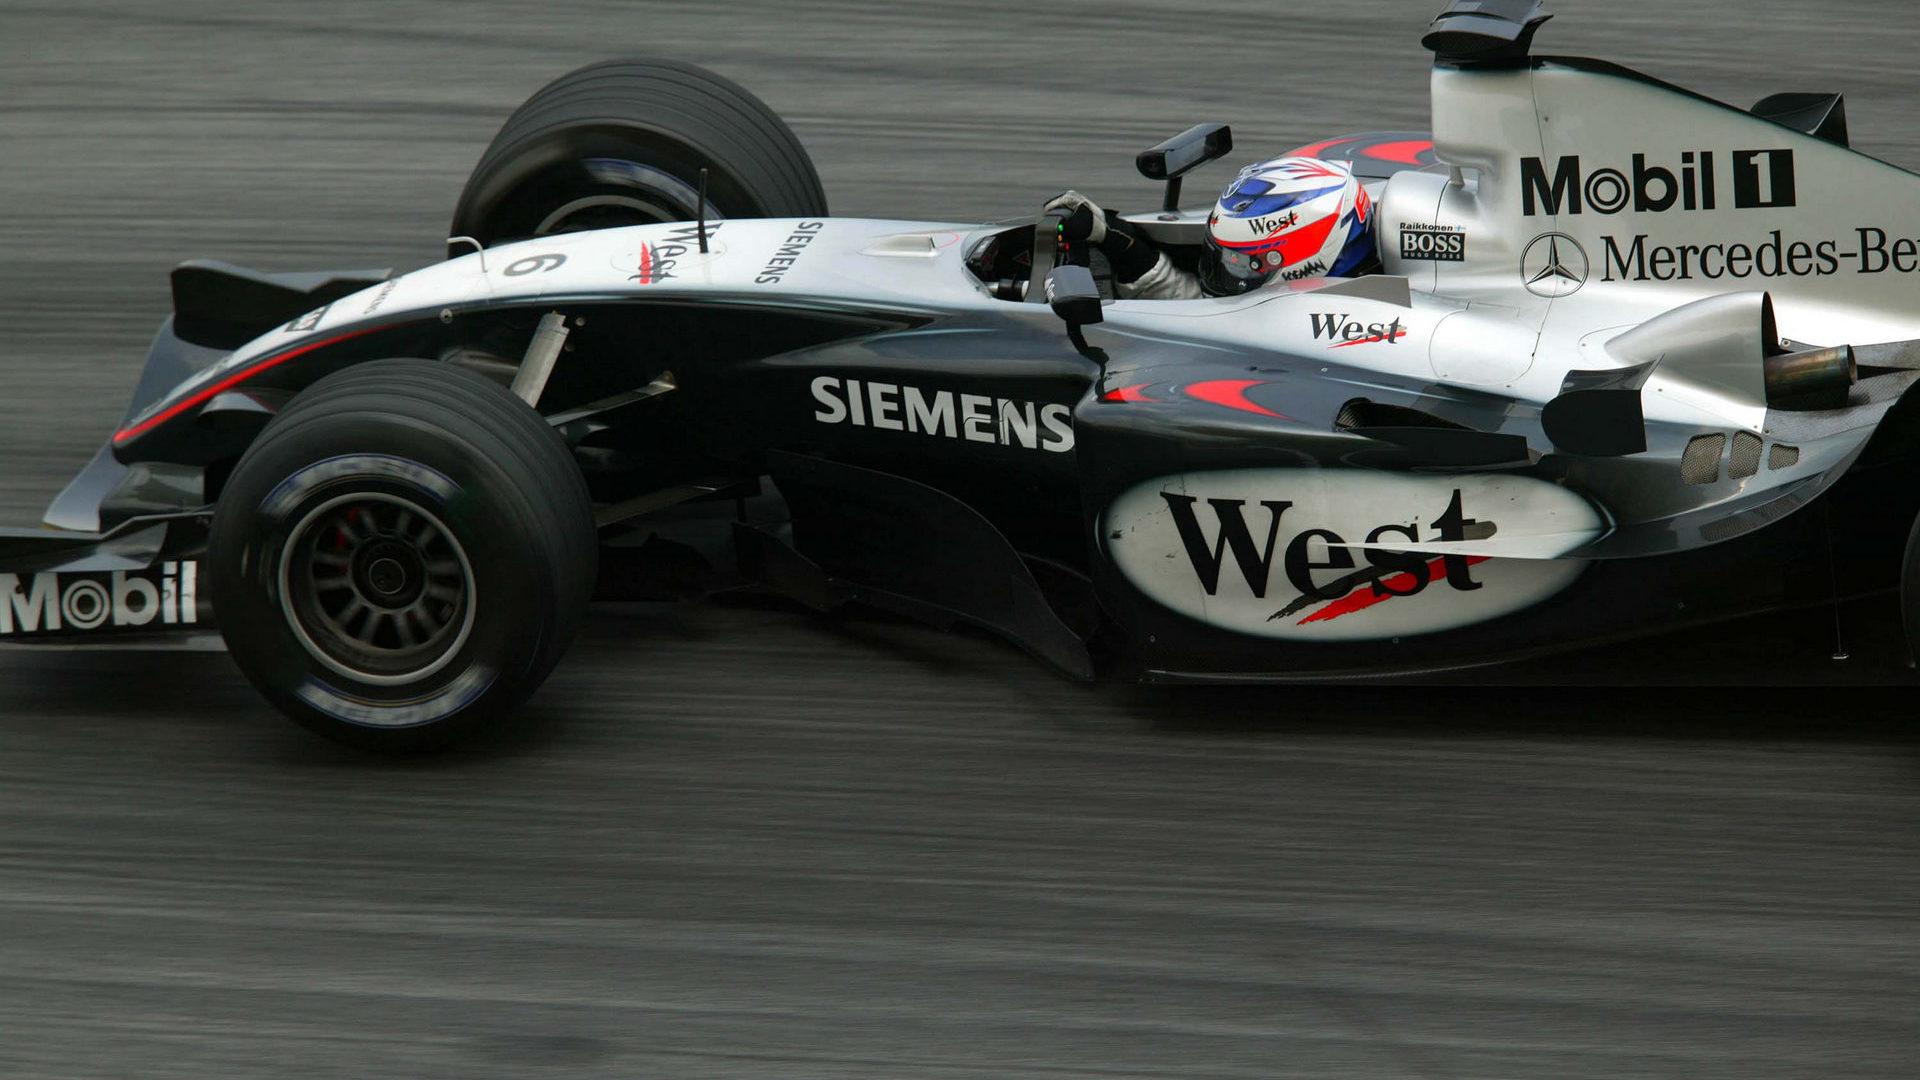 F1 wallpaper kimi raikkonen 6